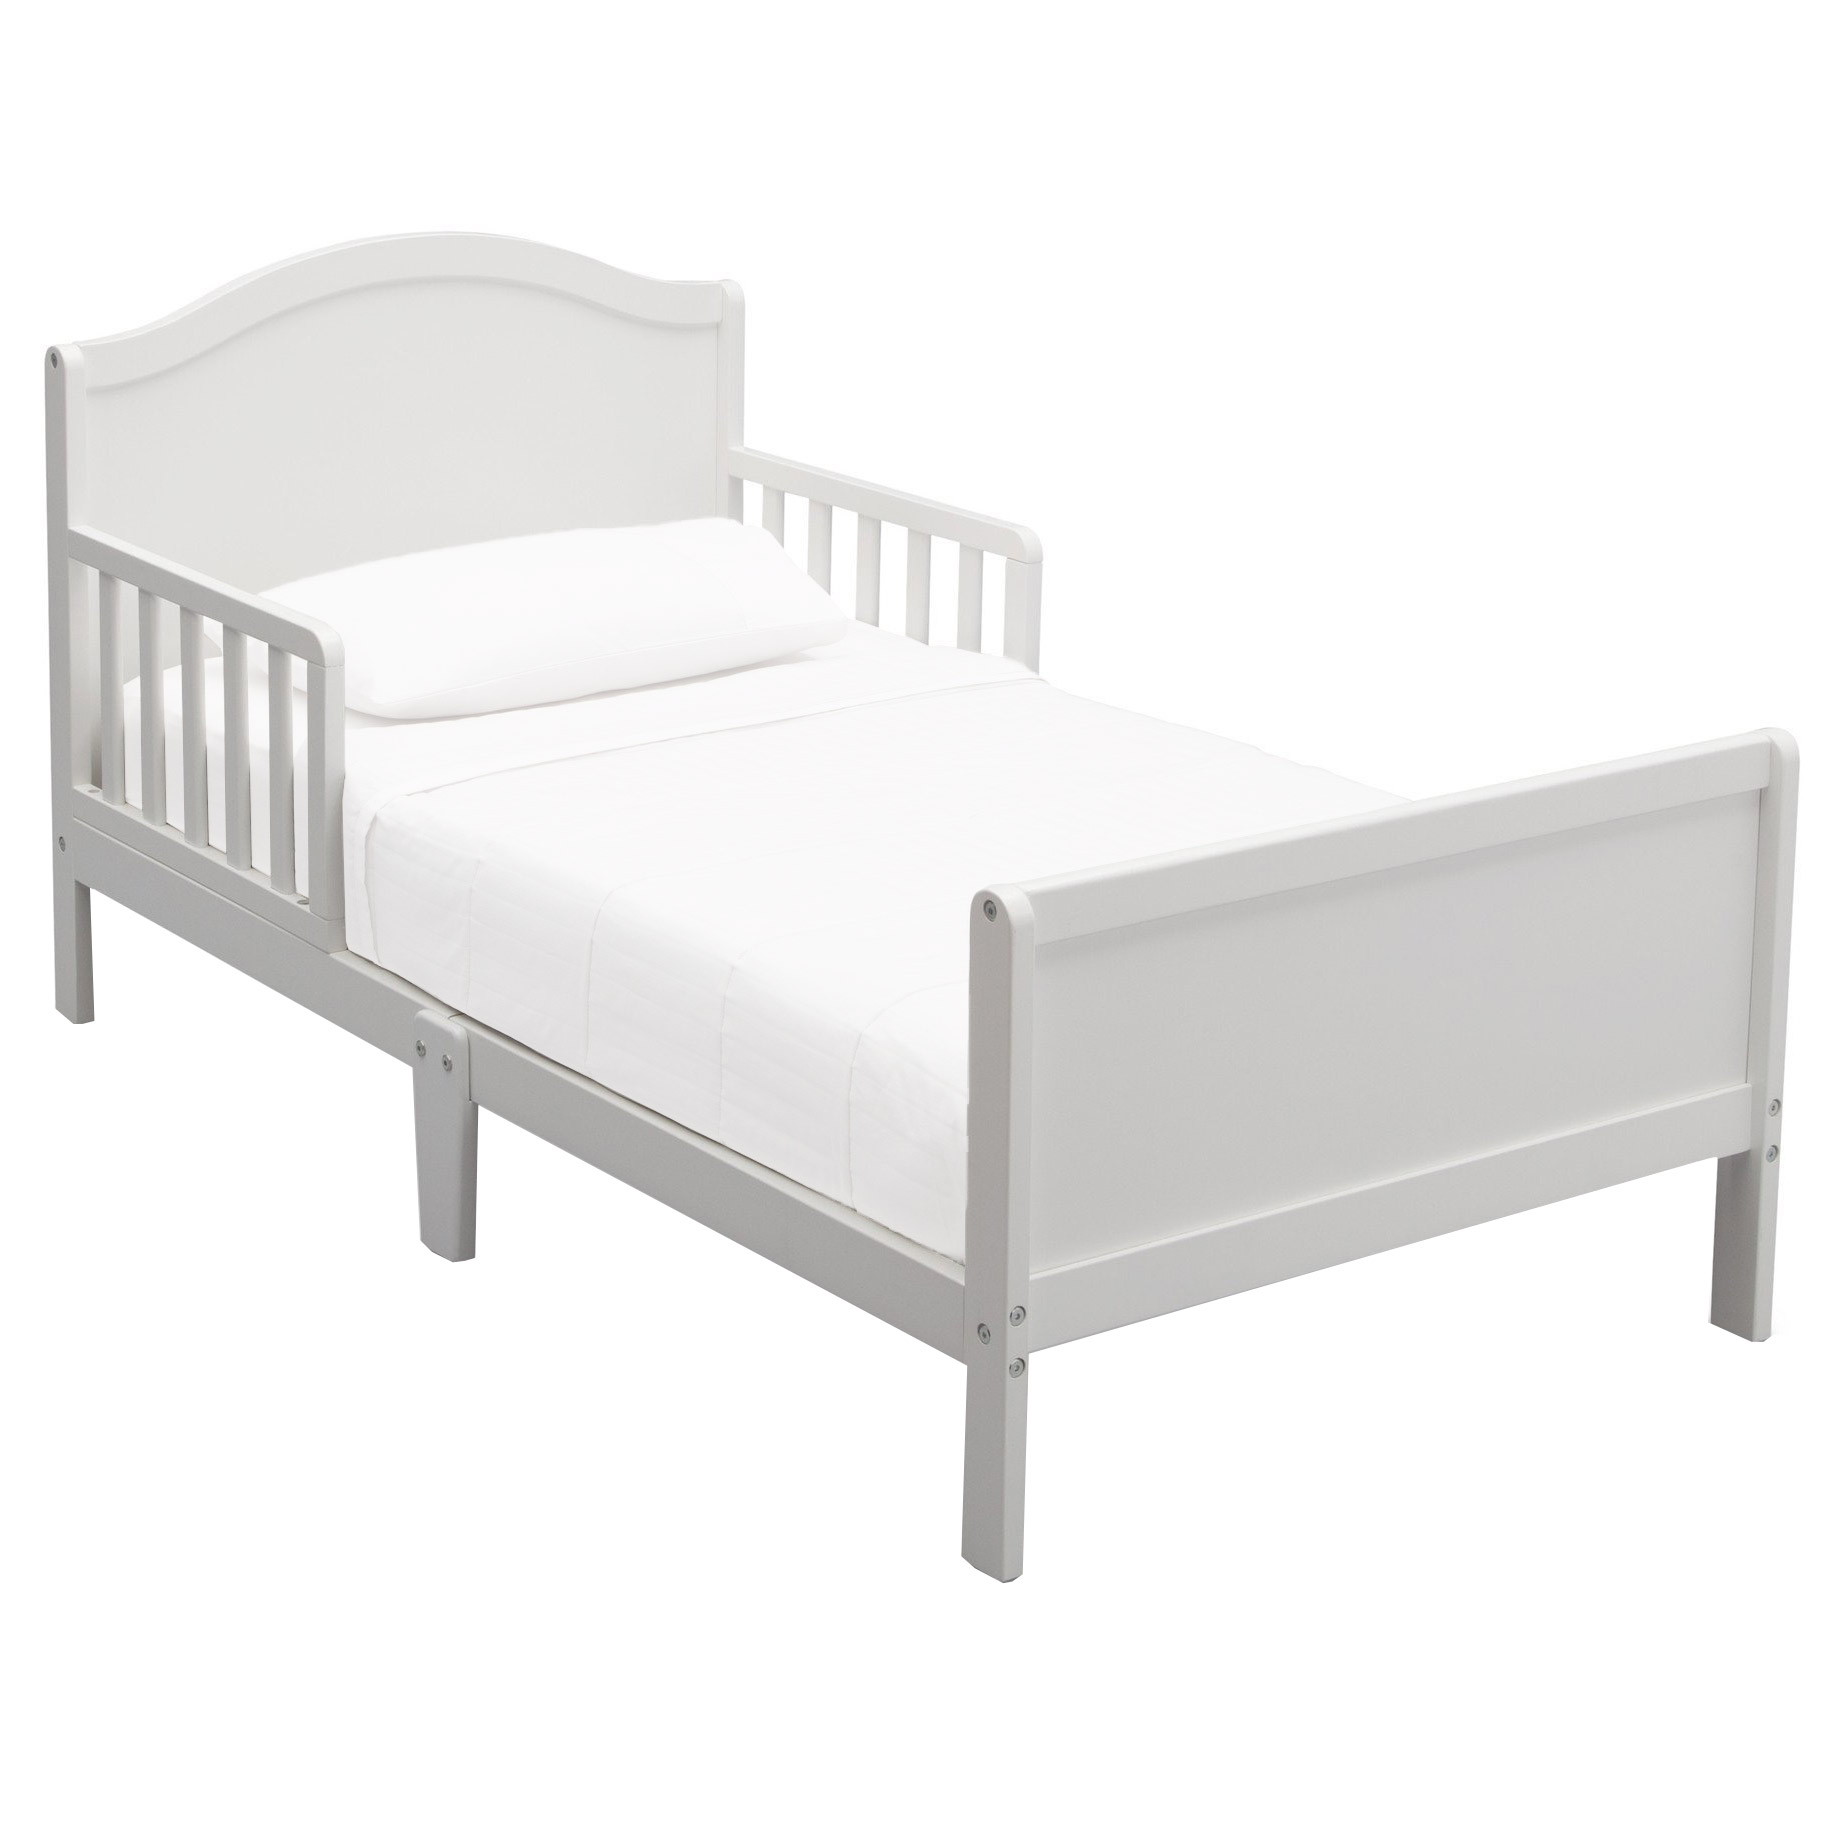 Delta Children Bennett Toddler Bed Frame With Guardrails White Bed